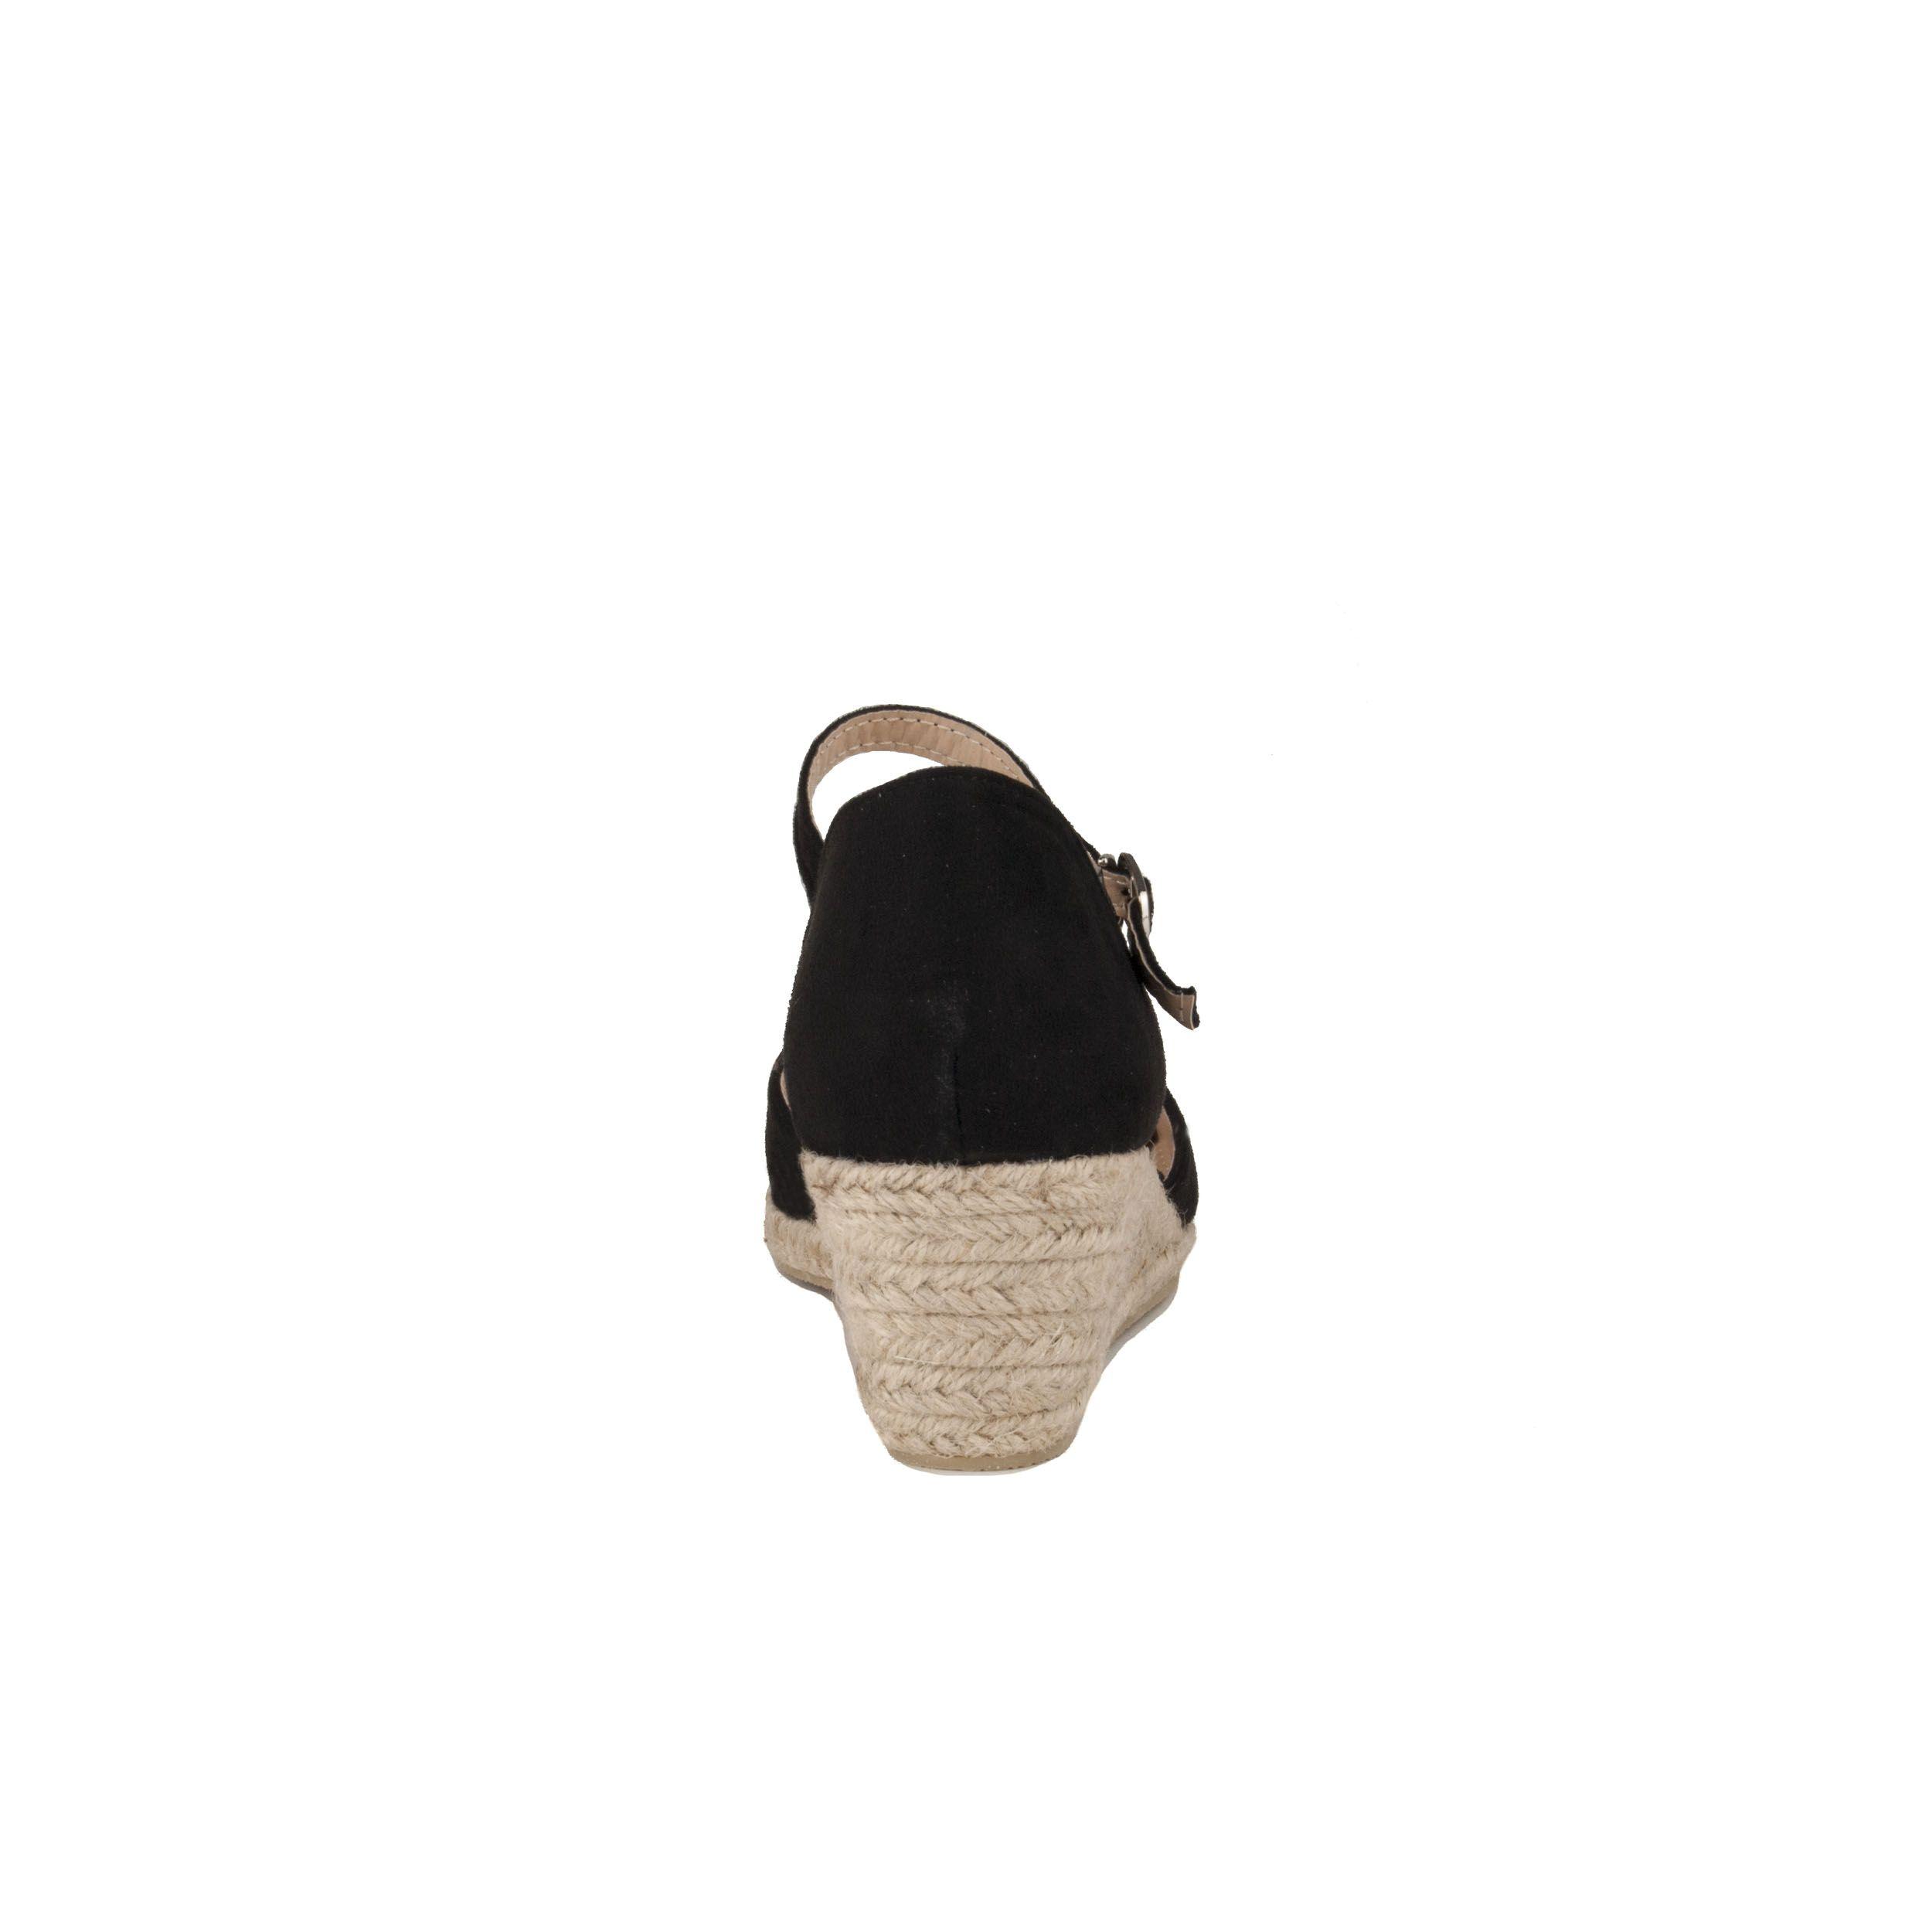 Montevita Wedge Shoe in Black